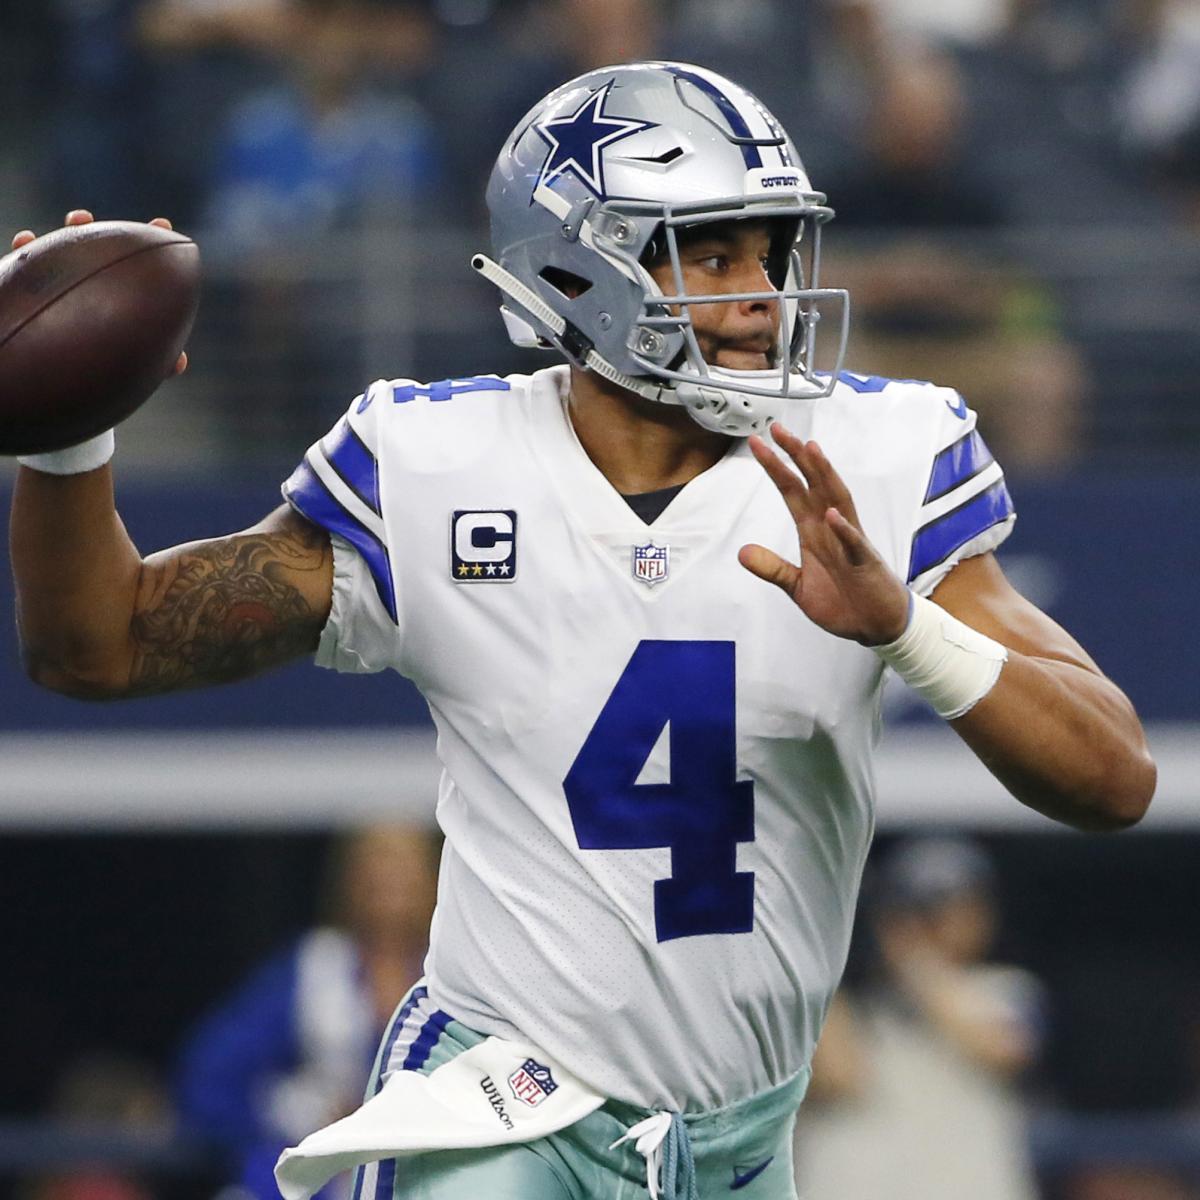 Dallas cowboys vs texans betting line sydney fc v brisbane roar betting preview